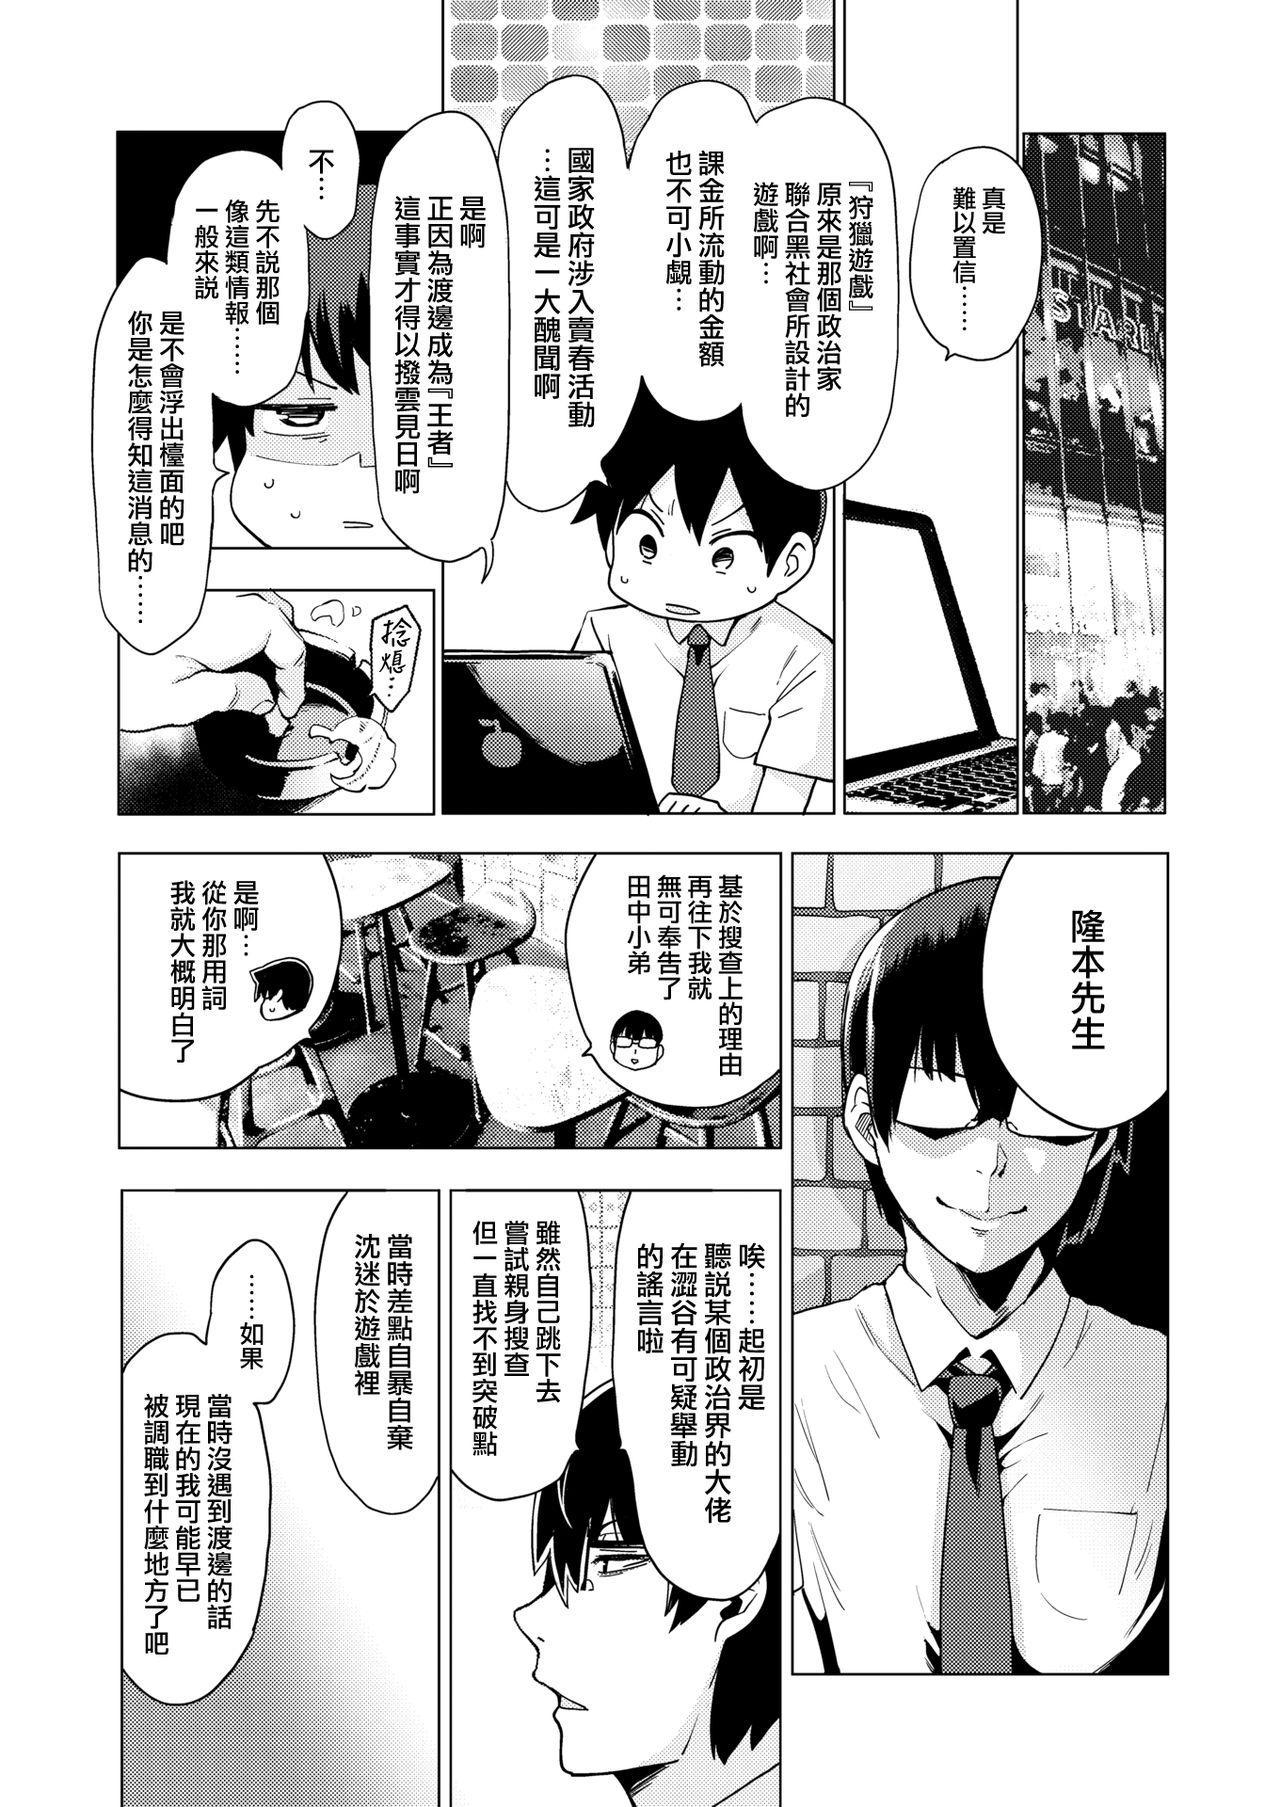 [Kenji] Karigogo ~Nikuyoku Shoujo~ #4 (COMIC X-EROS #76) [Chinese] [就變態翻譯組一人樣 x 我尻故我在個人漢化#37] [Digital] 26